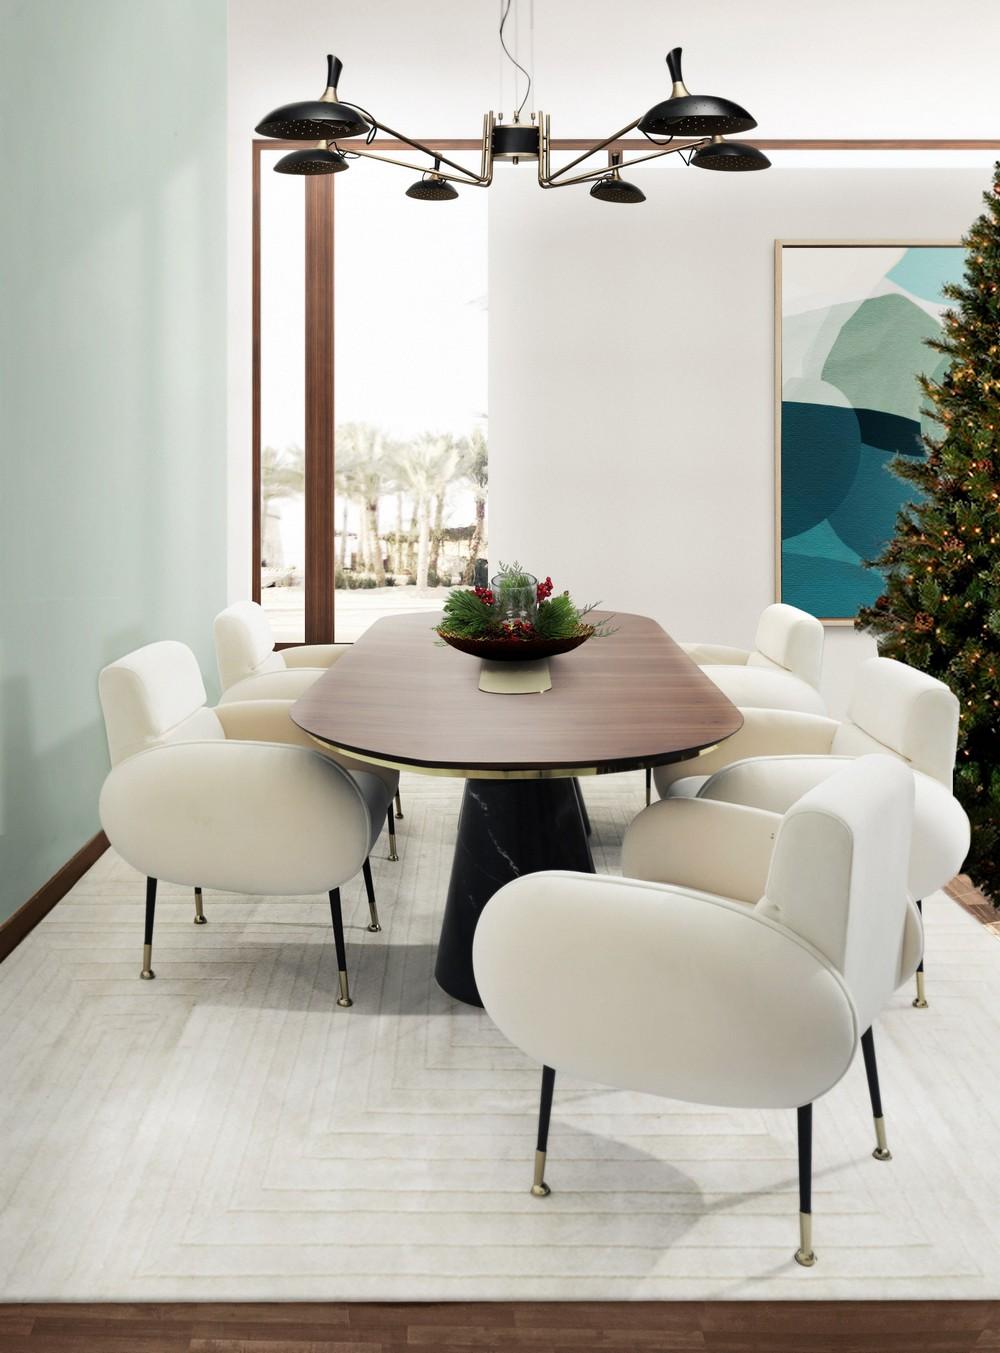 dining room Christmas Dining Room Decor Ideas christmas dining room decor ideas 9